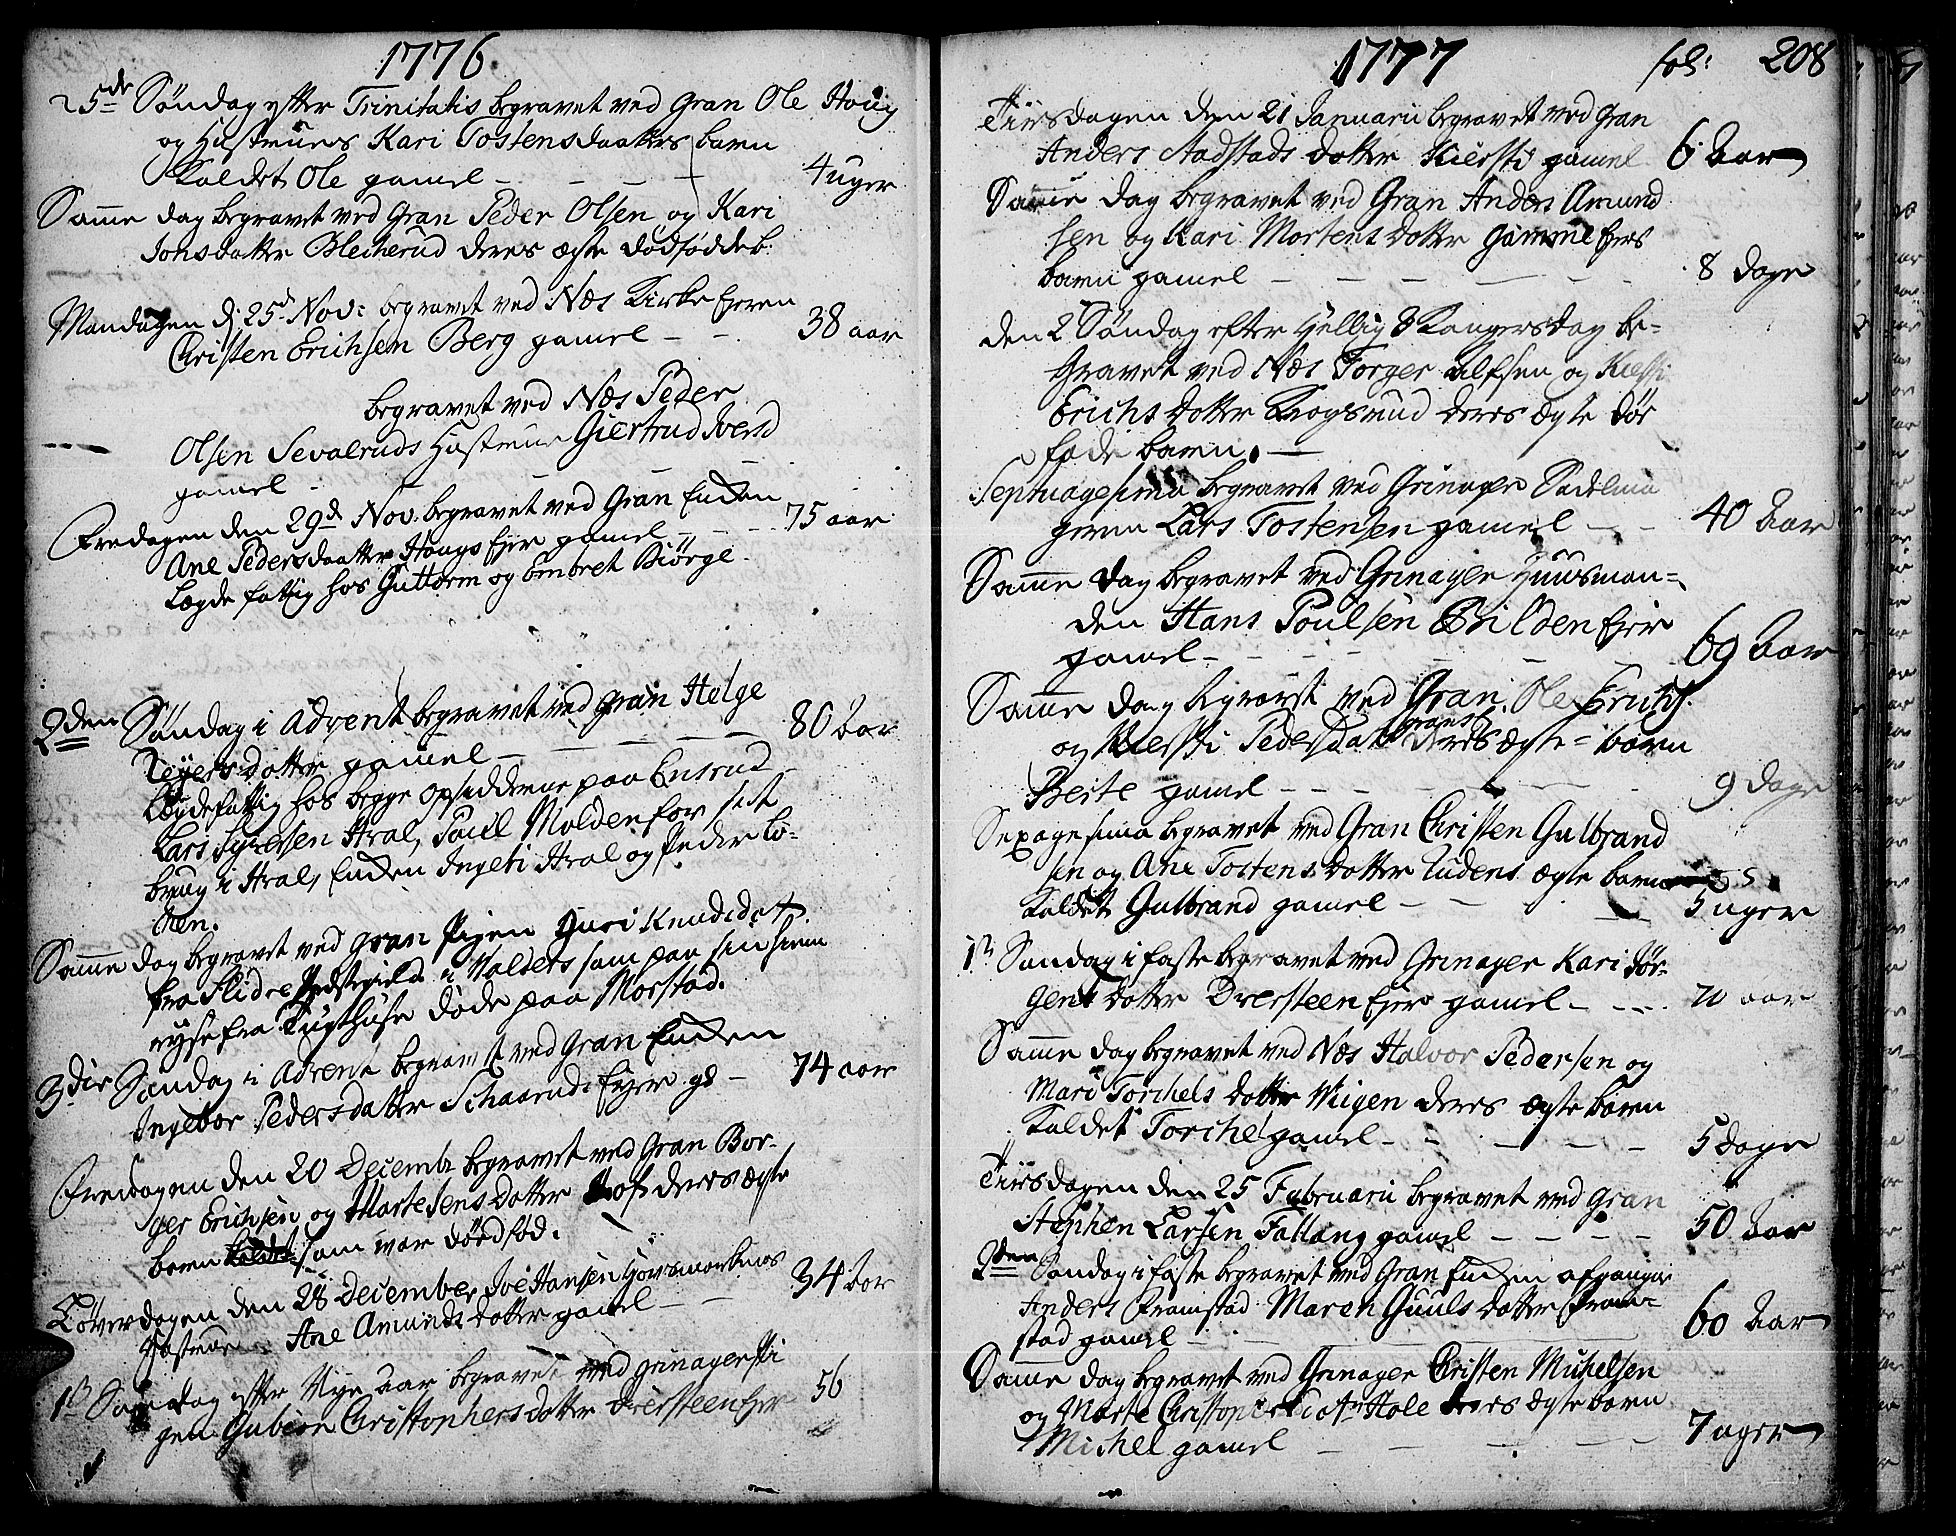 SAH, Gran prestekontor, Ministerialbok nr. 5, 1776-1788, s. 208